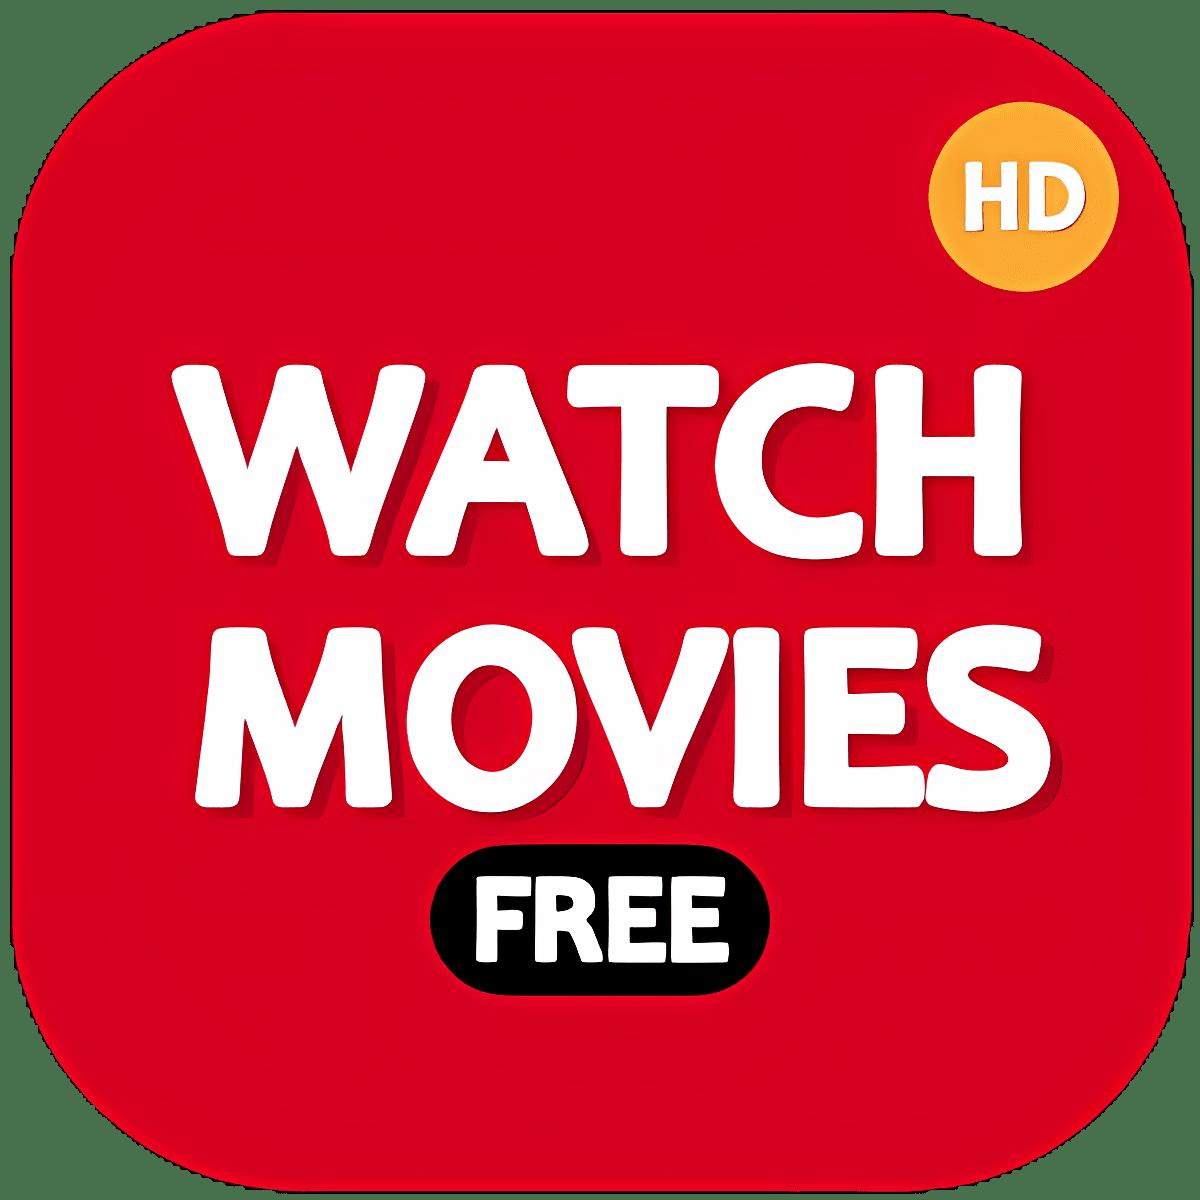 Watch Full Movies Free